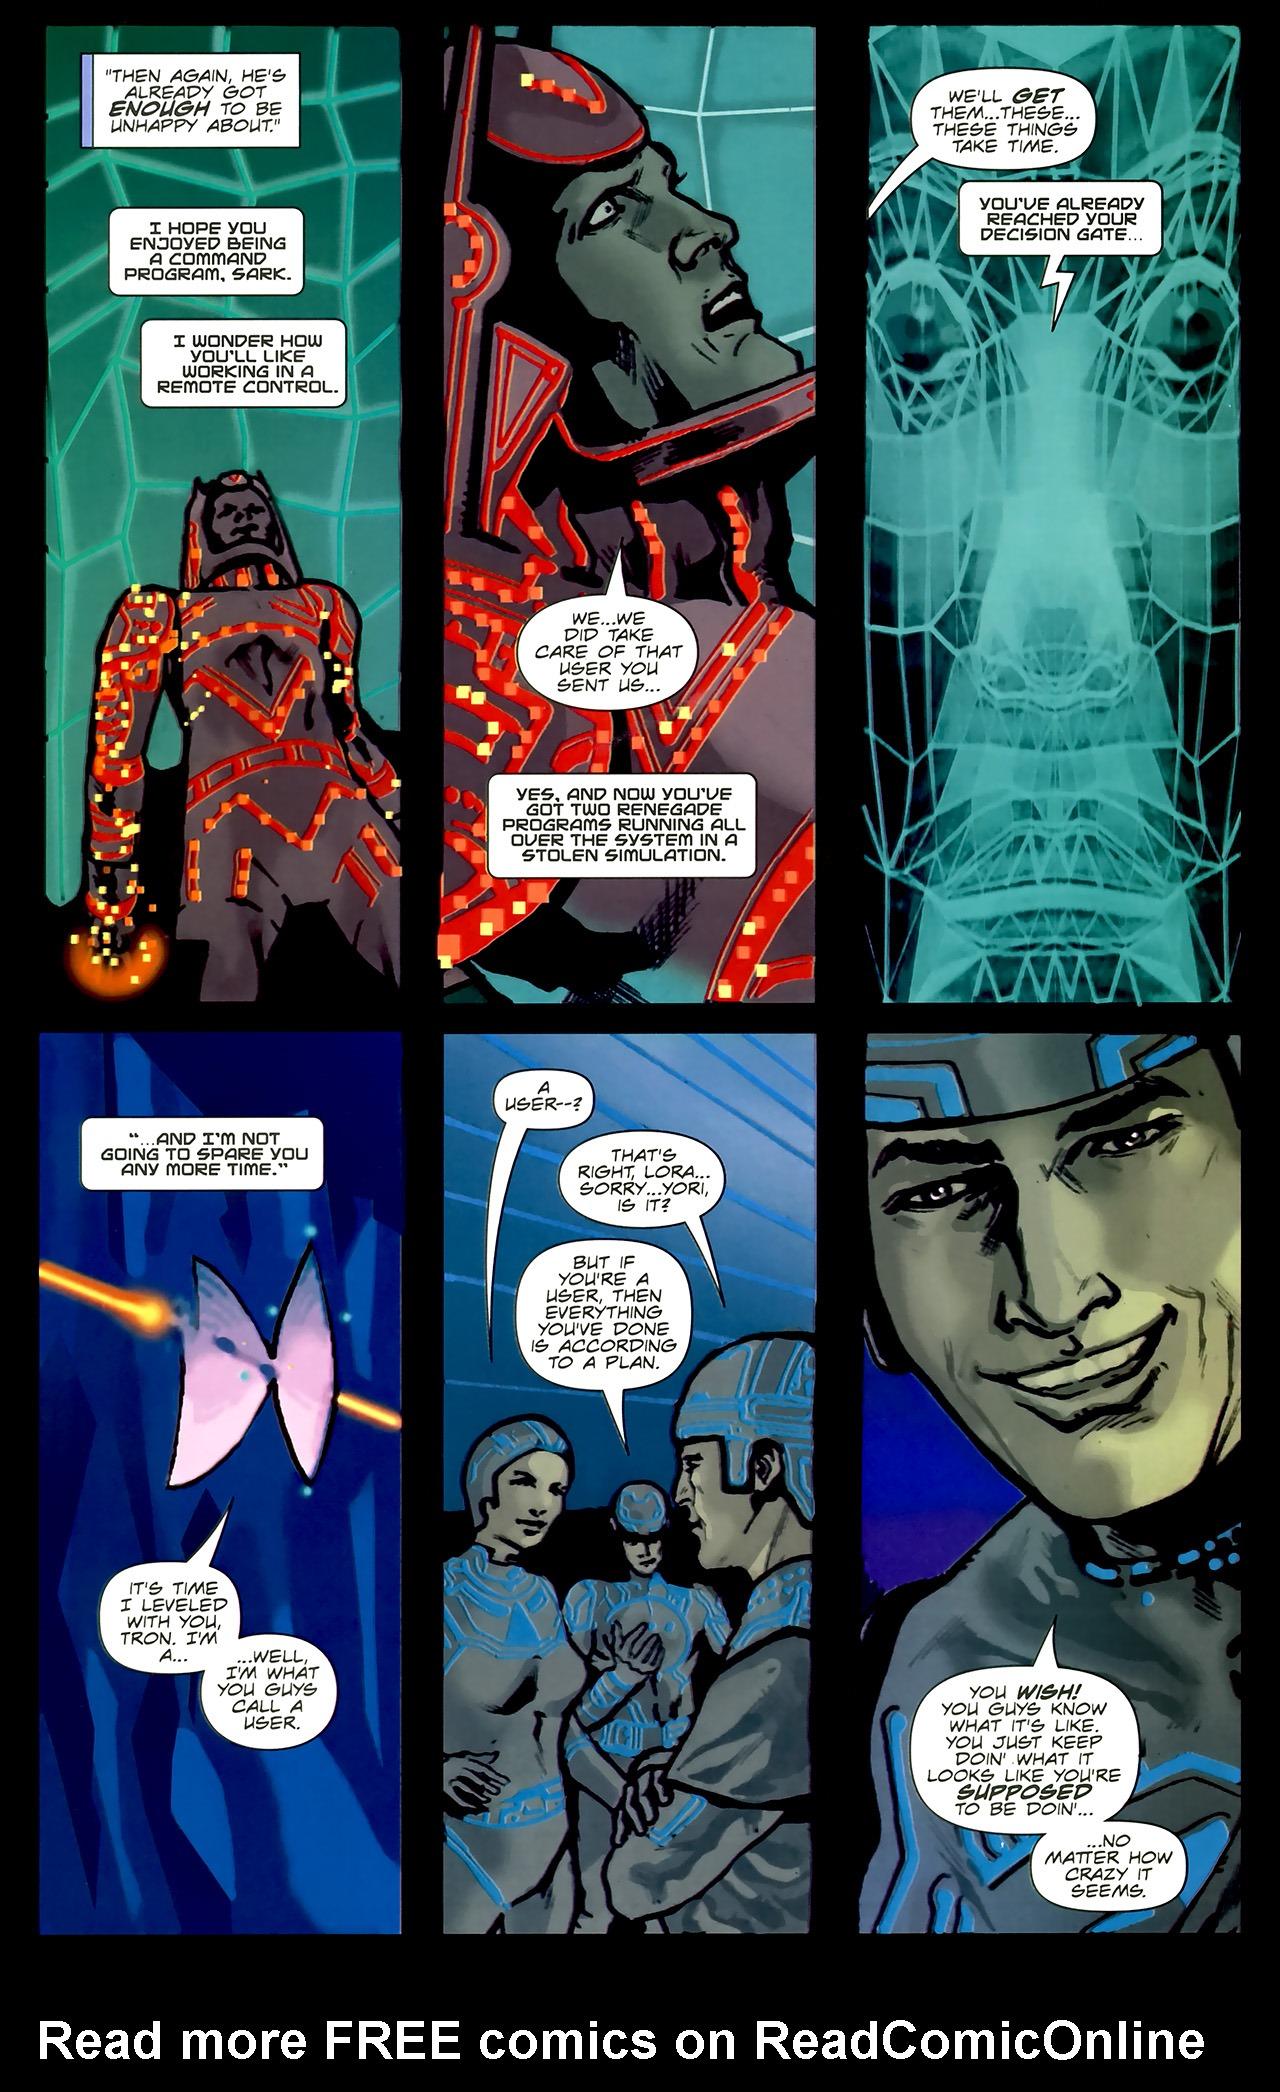 Read online TRON: Original Movie Adaptation comic -  Issue #2 - 22